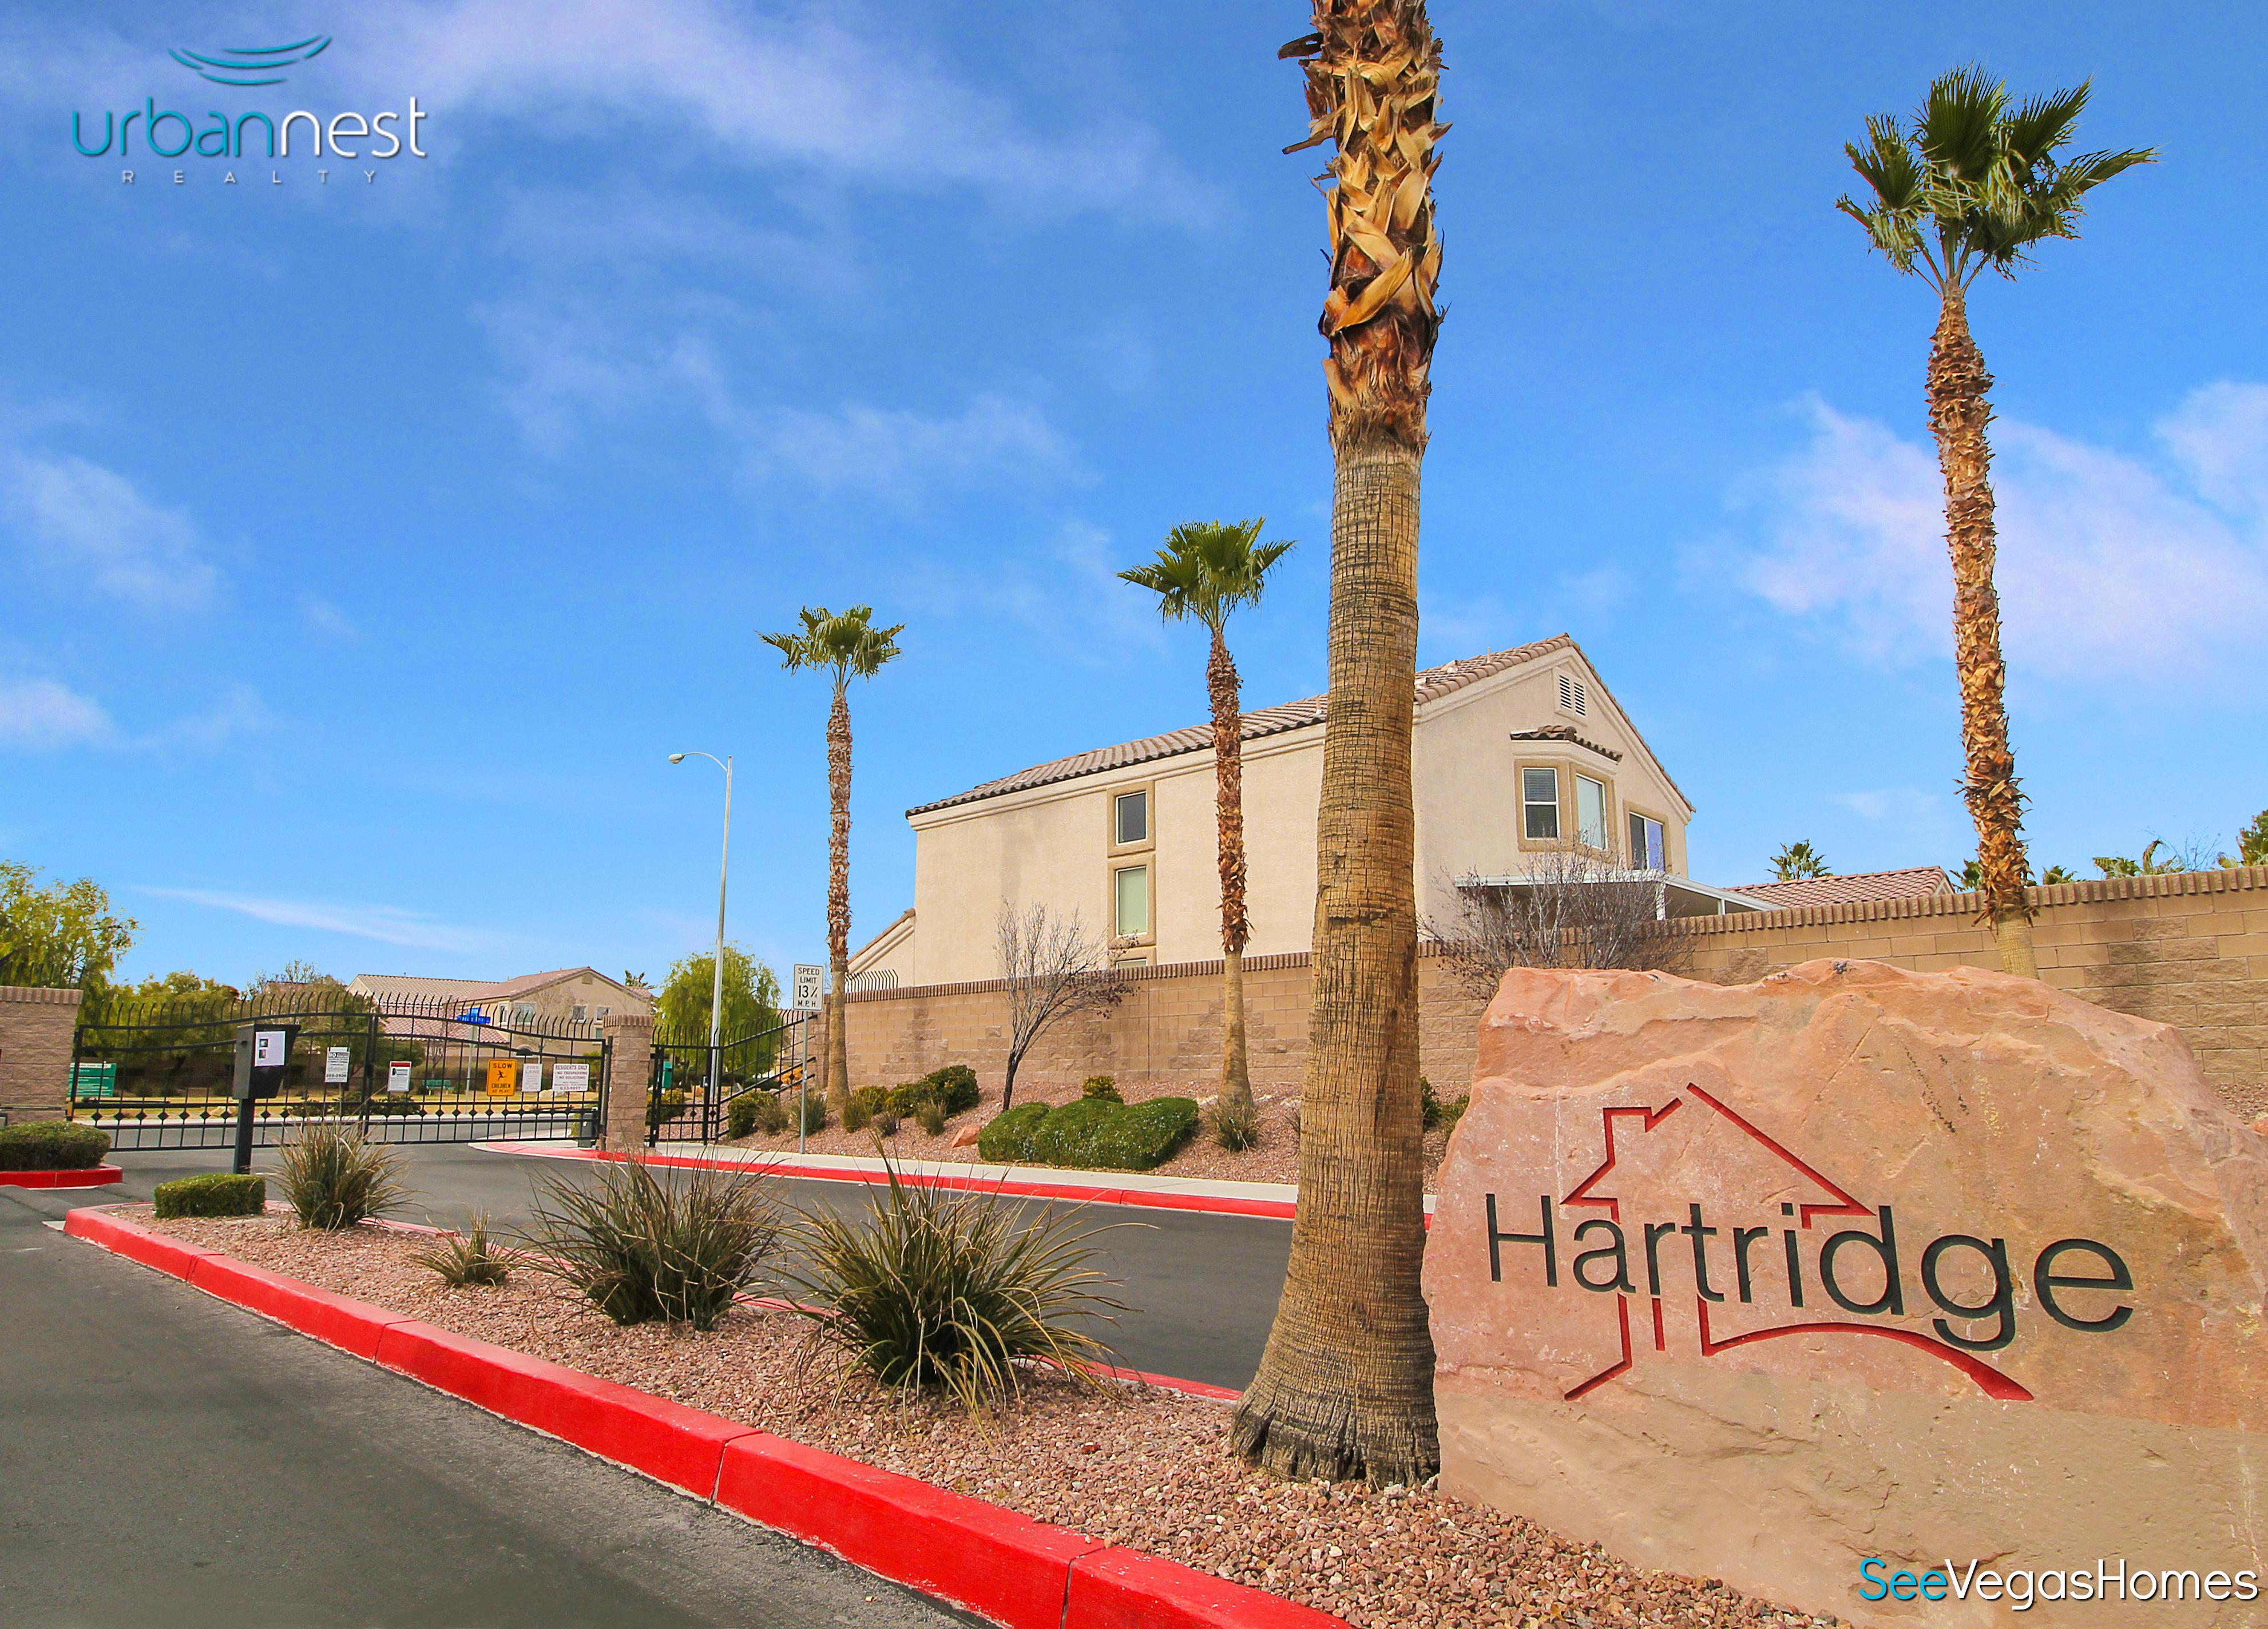 Hartridge North Las Vegas NV 89031 SeeVegasHomes